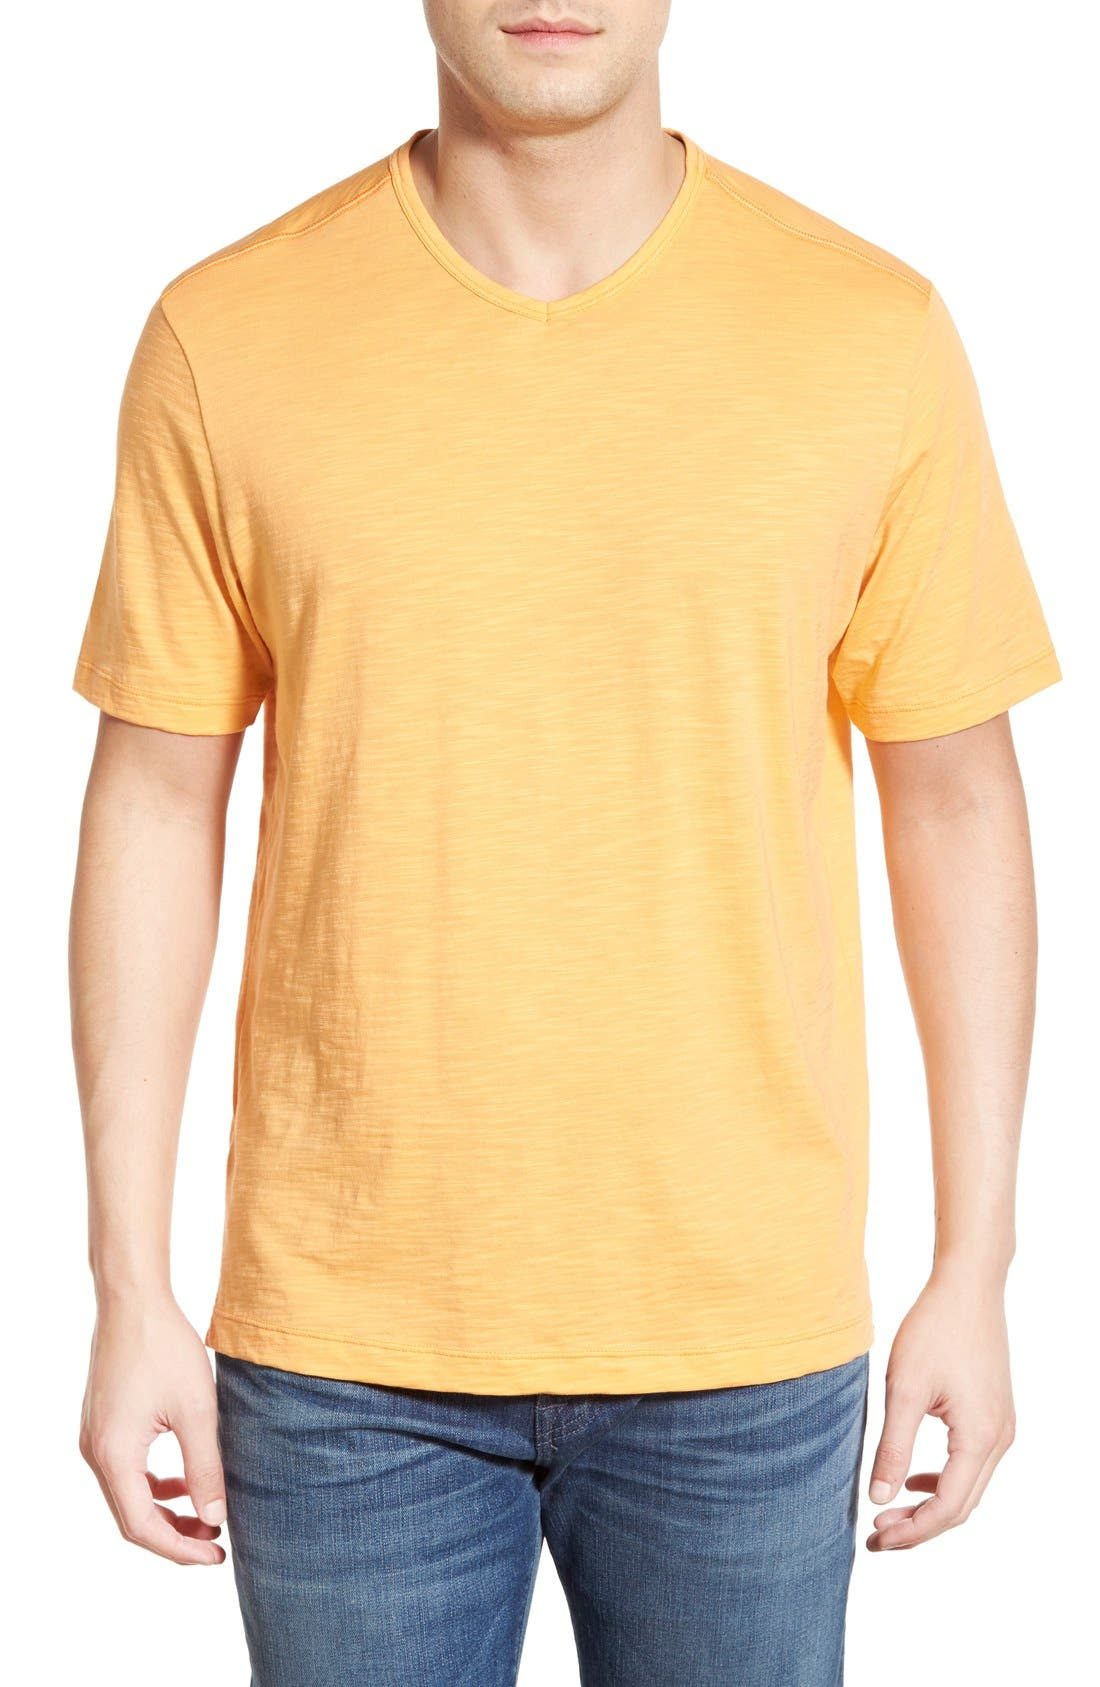 Image of Tommy Bahama 'Portside Player' Pima Cotton T-Shirt